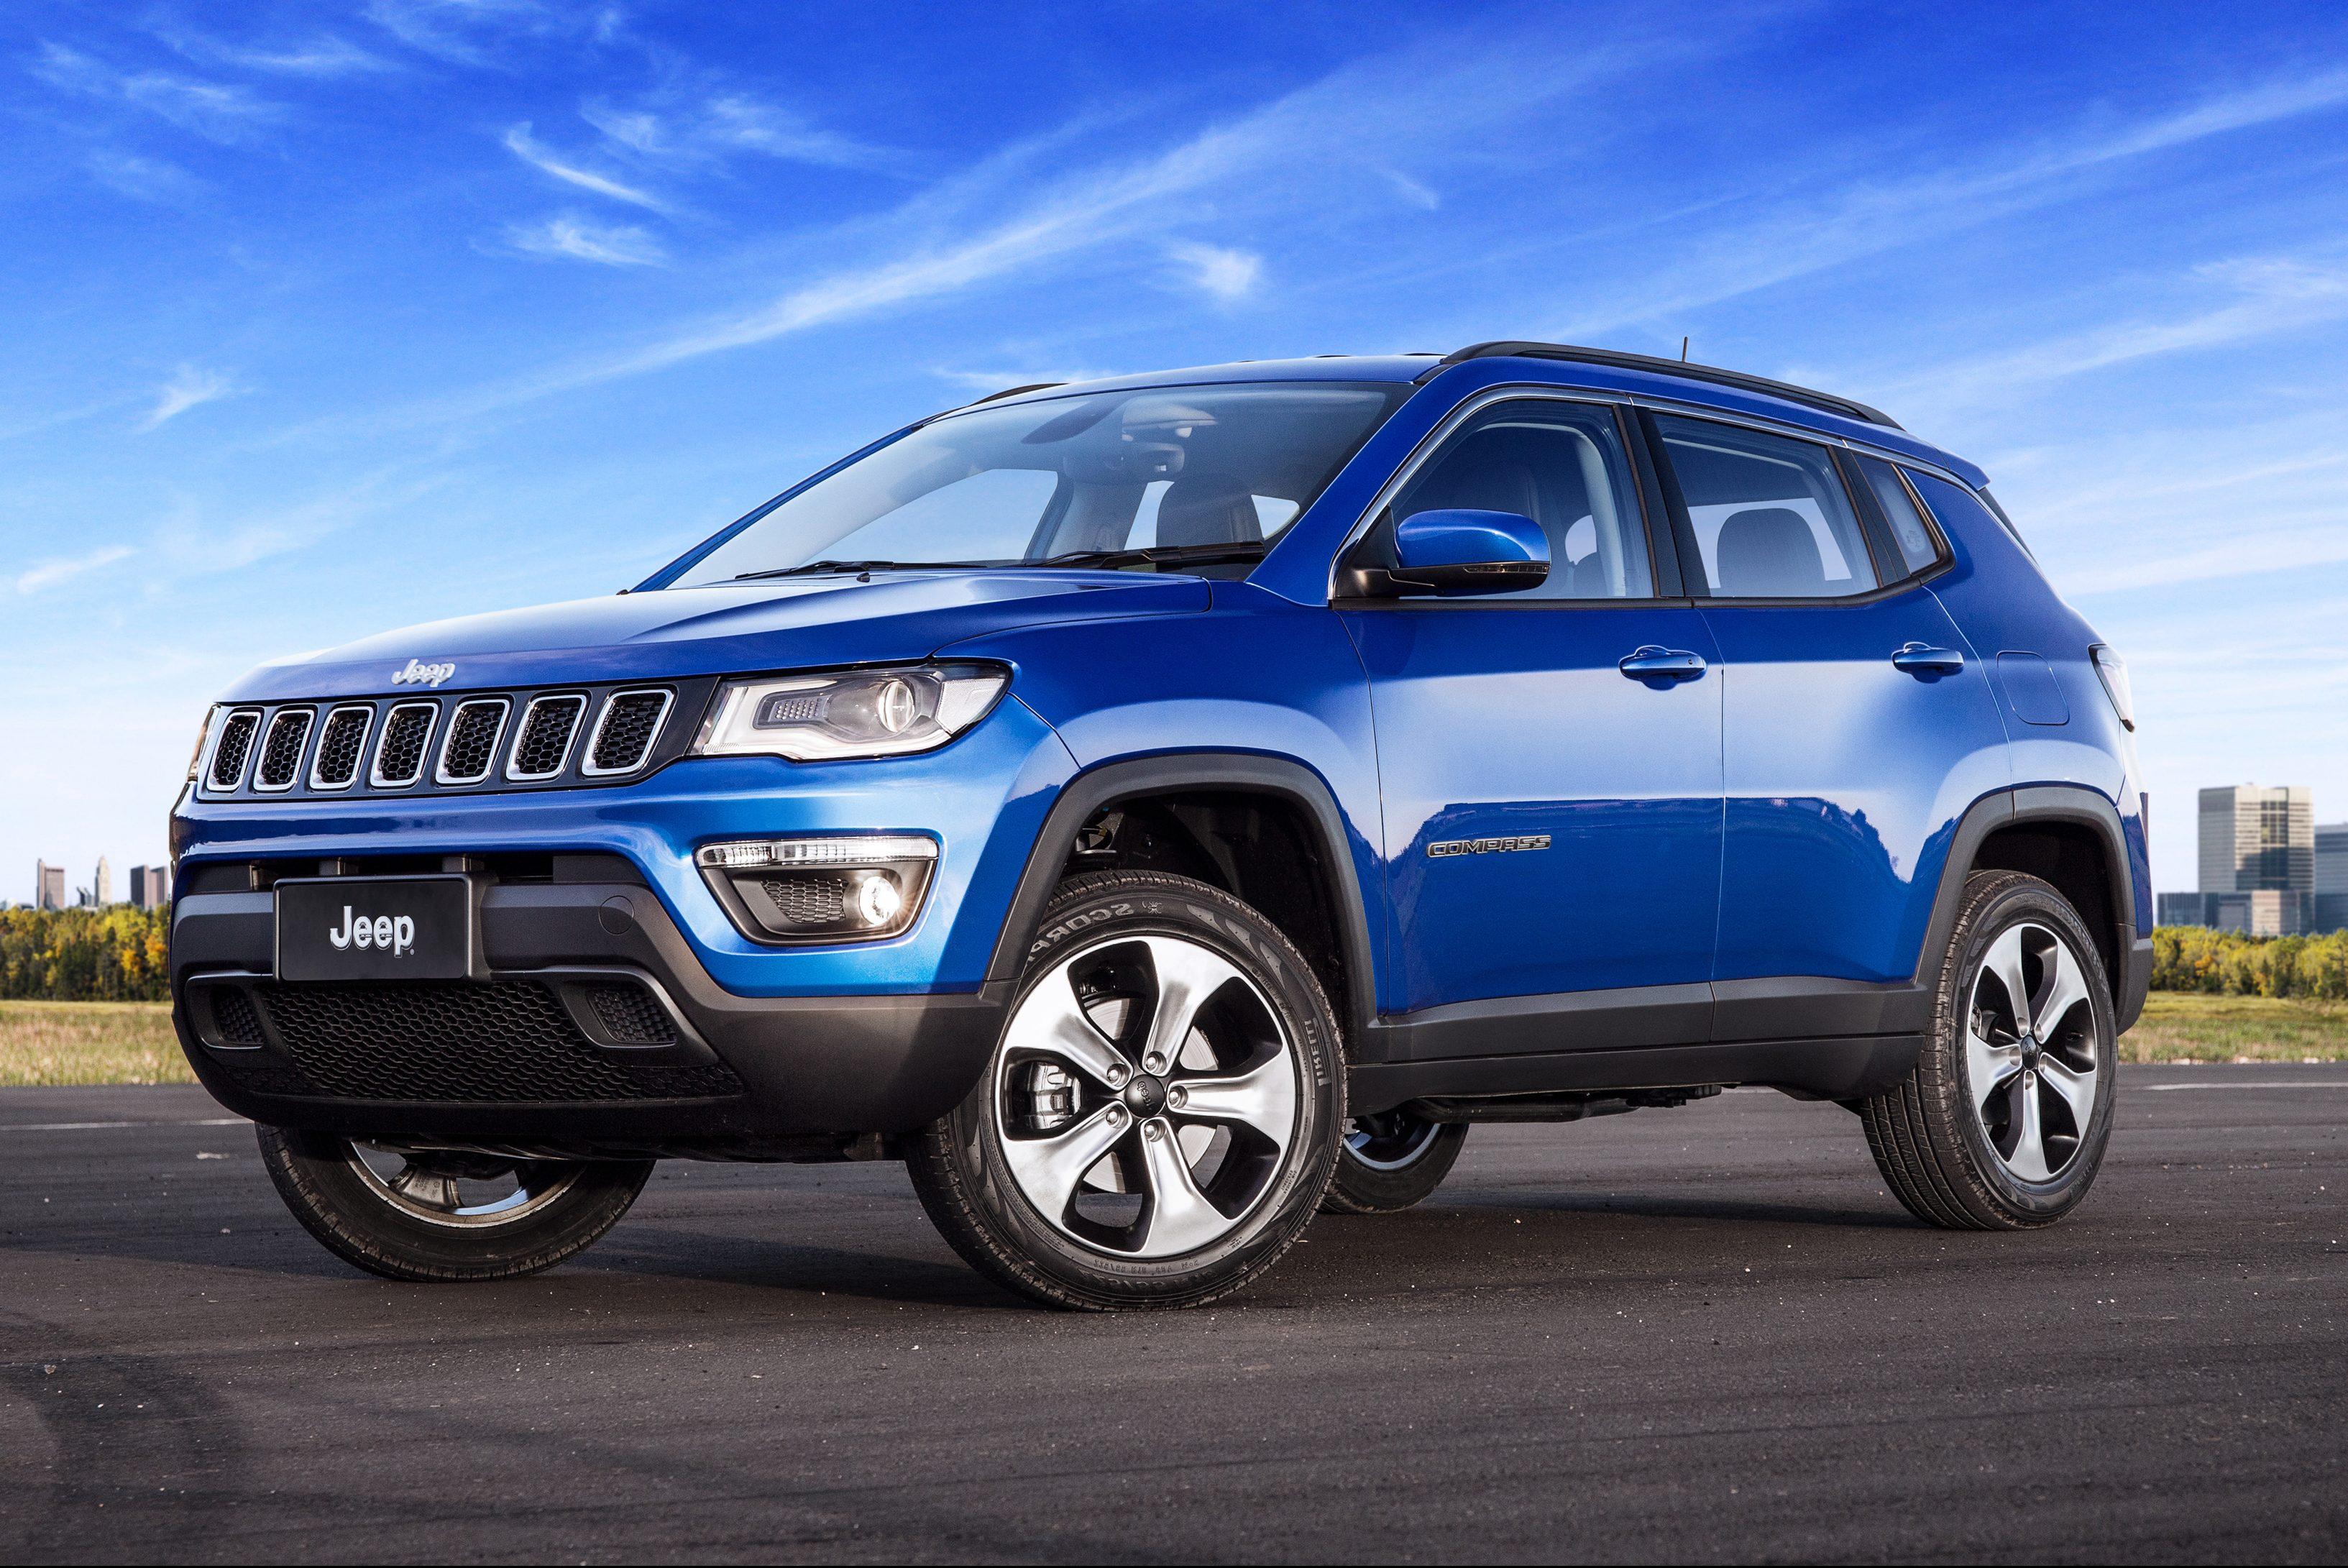 Jeep Lanca Campanha Para Pcd Com Compass Diesel A Menos De R